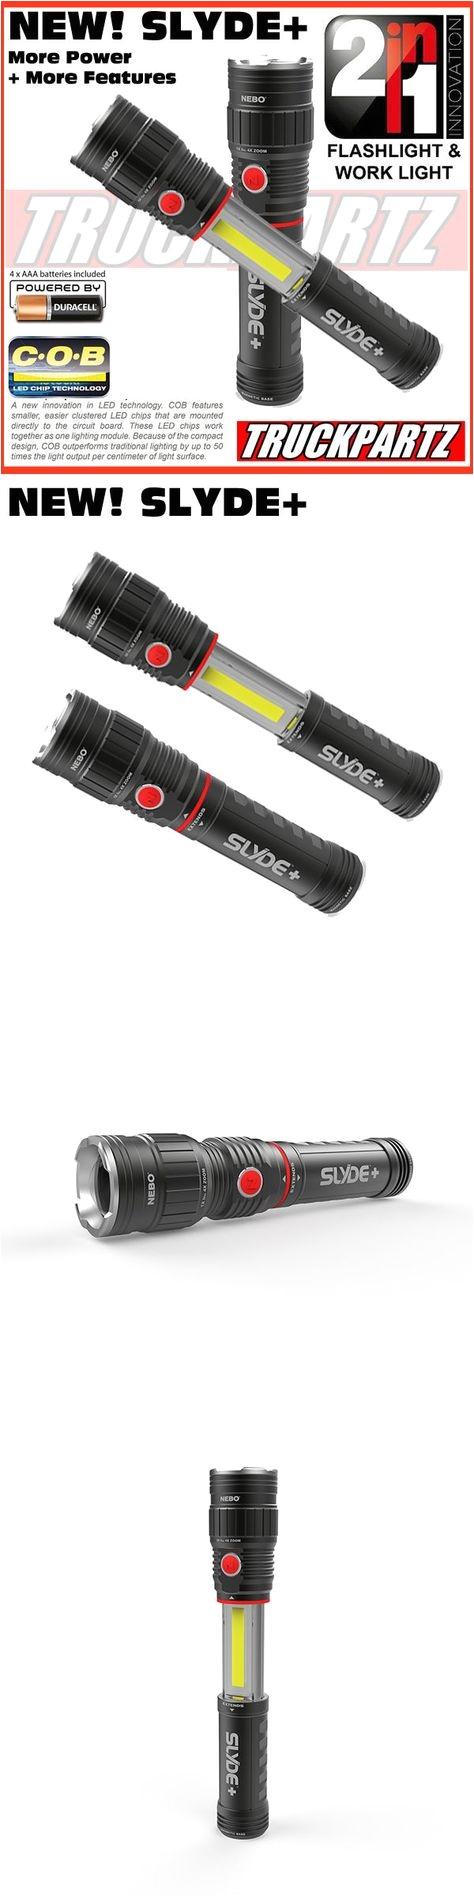 sidiou group imalent latest 4pcs cree xml2 u4 led and 2 pcs xpl led flashlight torch 4200lumens1180lumens flashlight usb rechargeable led torch lan